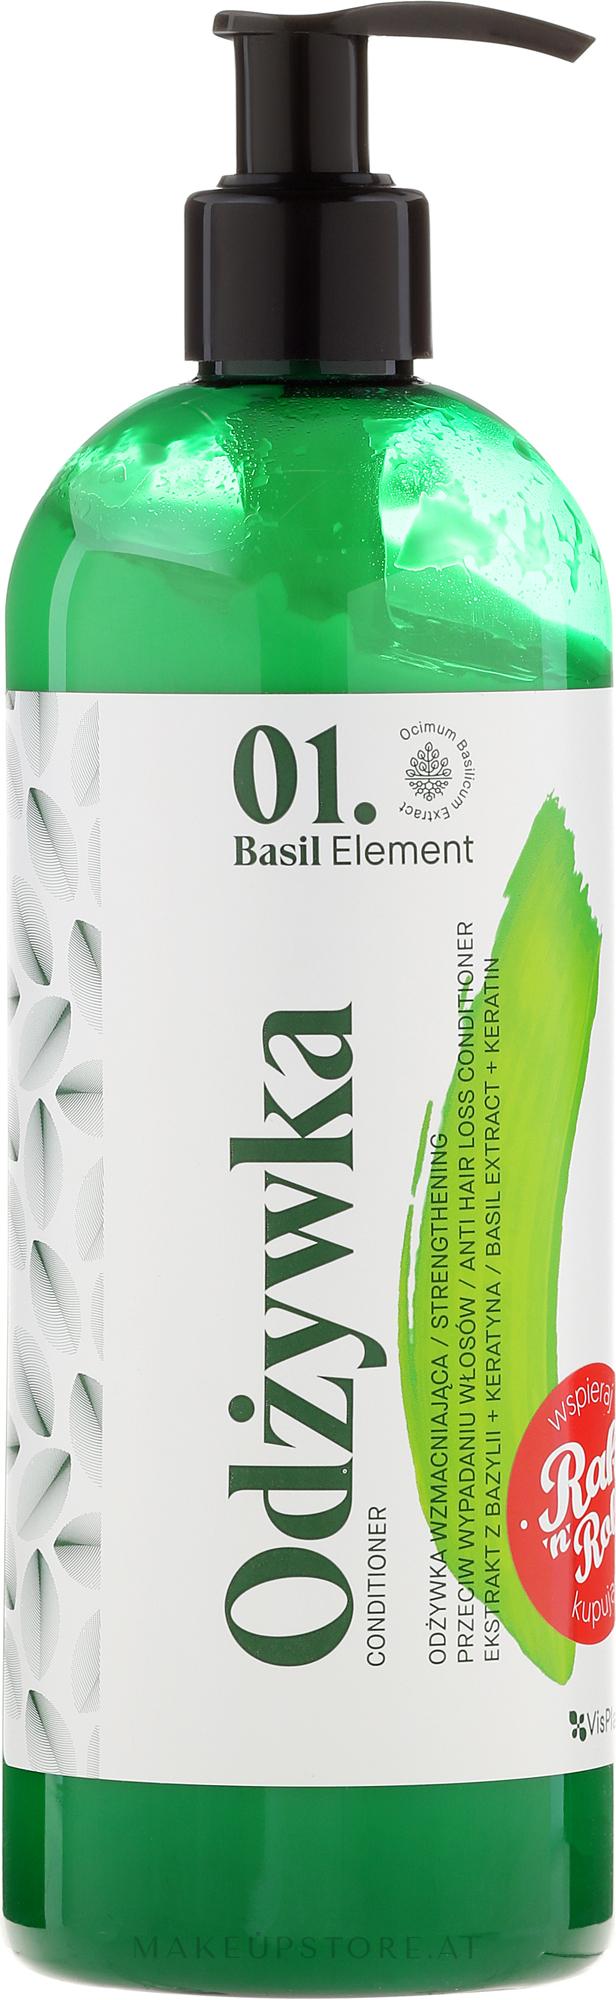 Spülung gegen Haarausfall mit Basilikum Extrakt und Keratin - _Element Basil Strengthening Anti-Hair Loss Conditioner — Bild 500 ml